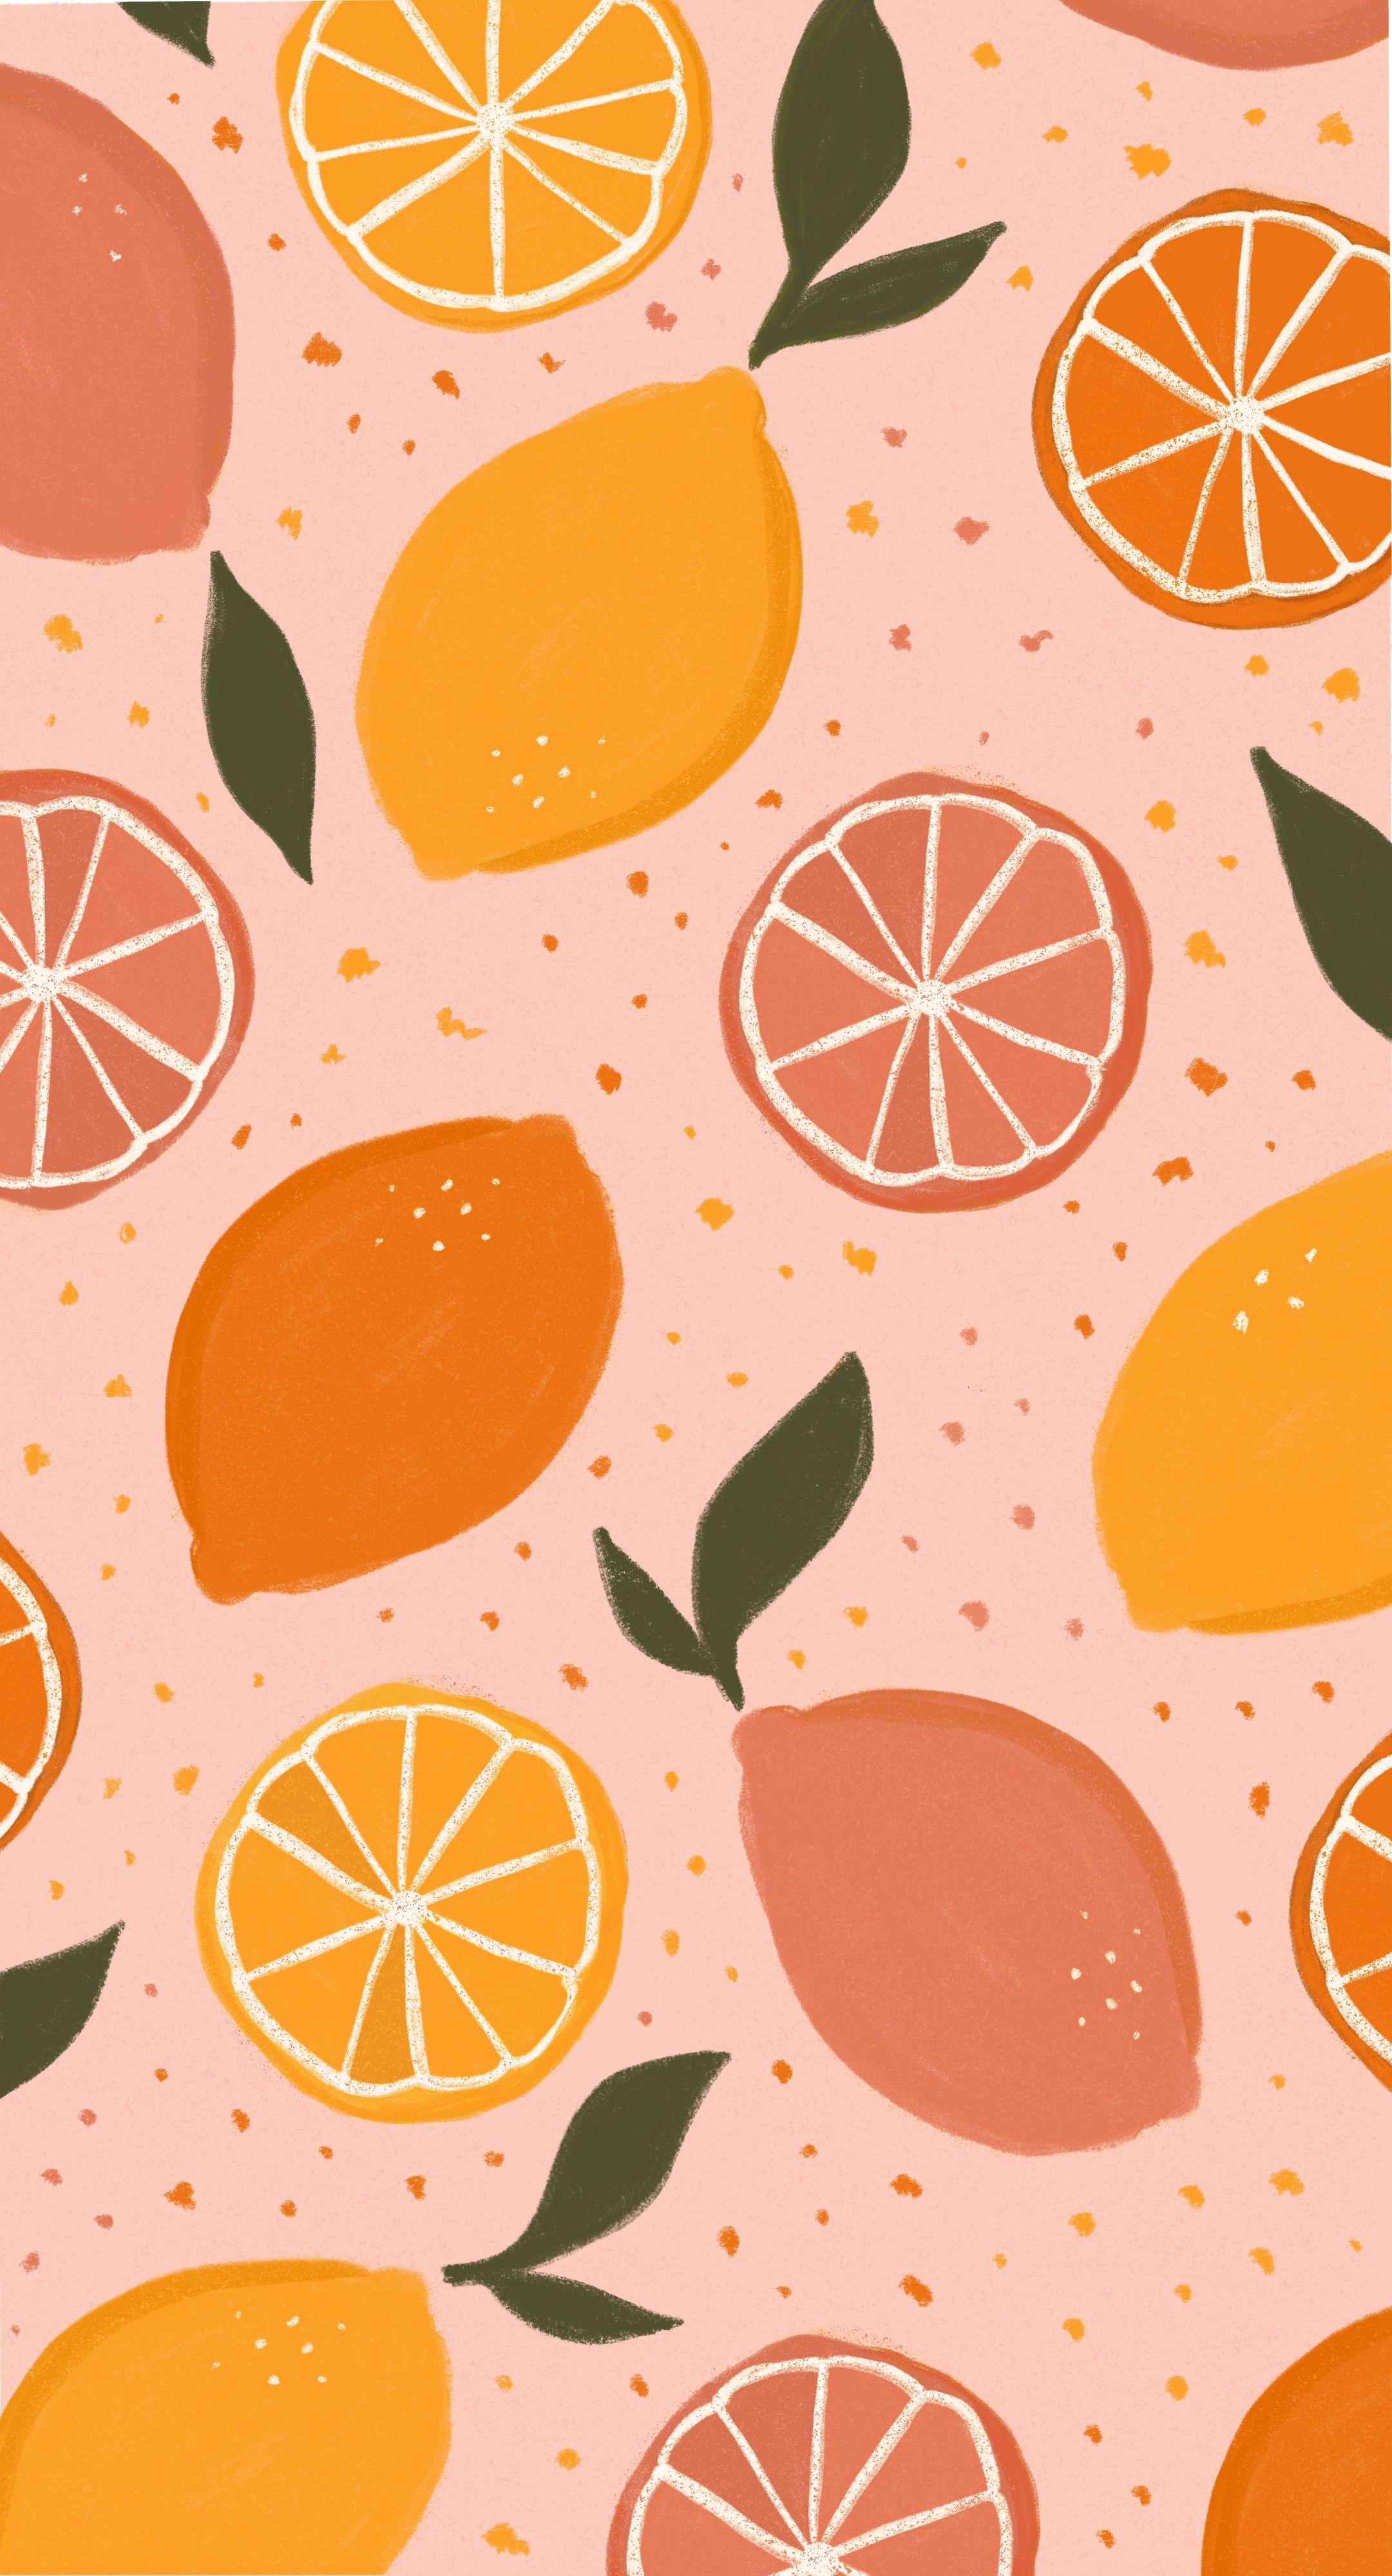 Lemon Pattern Illustration Cute Patterns Wallpaper Art Wallpaper Fruit Wallpaper